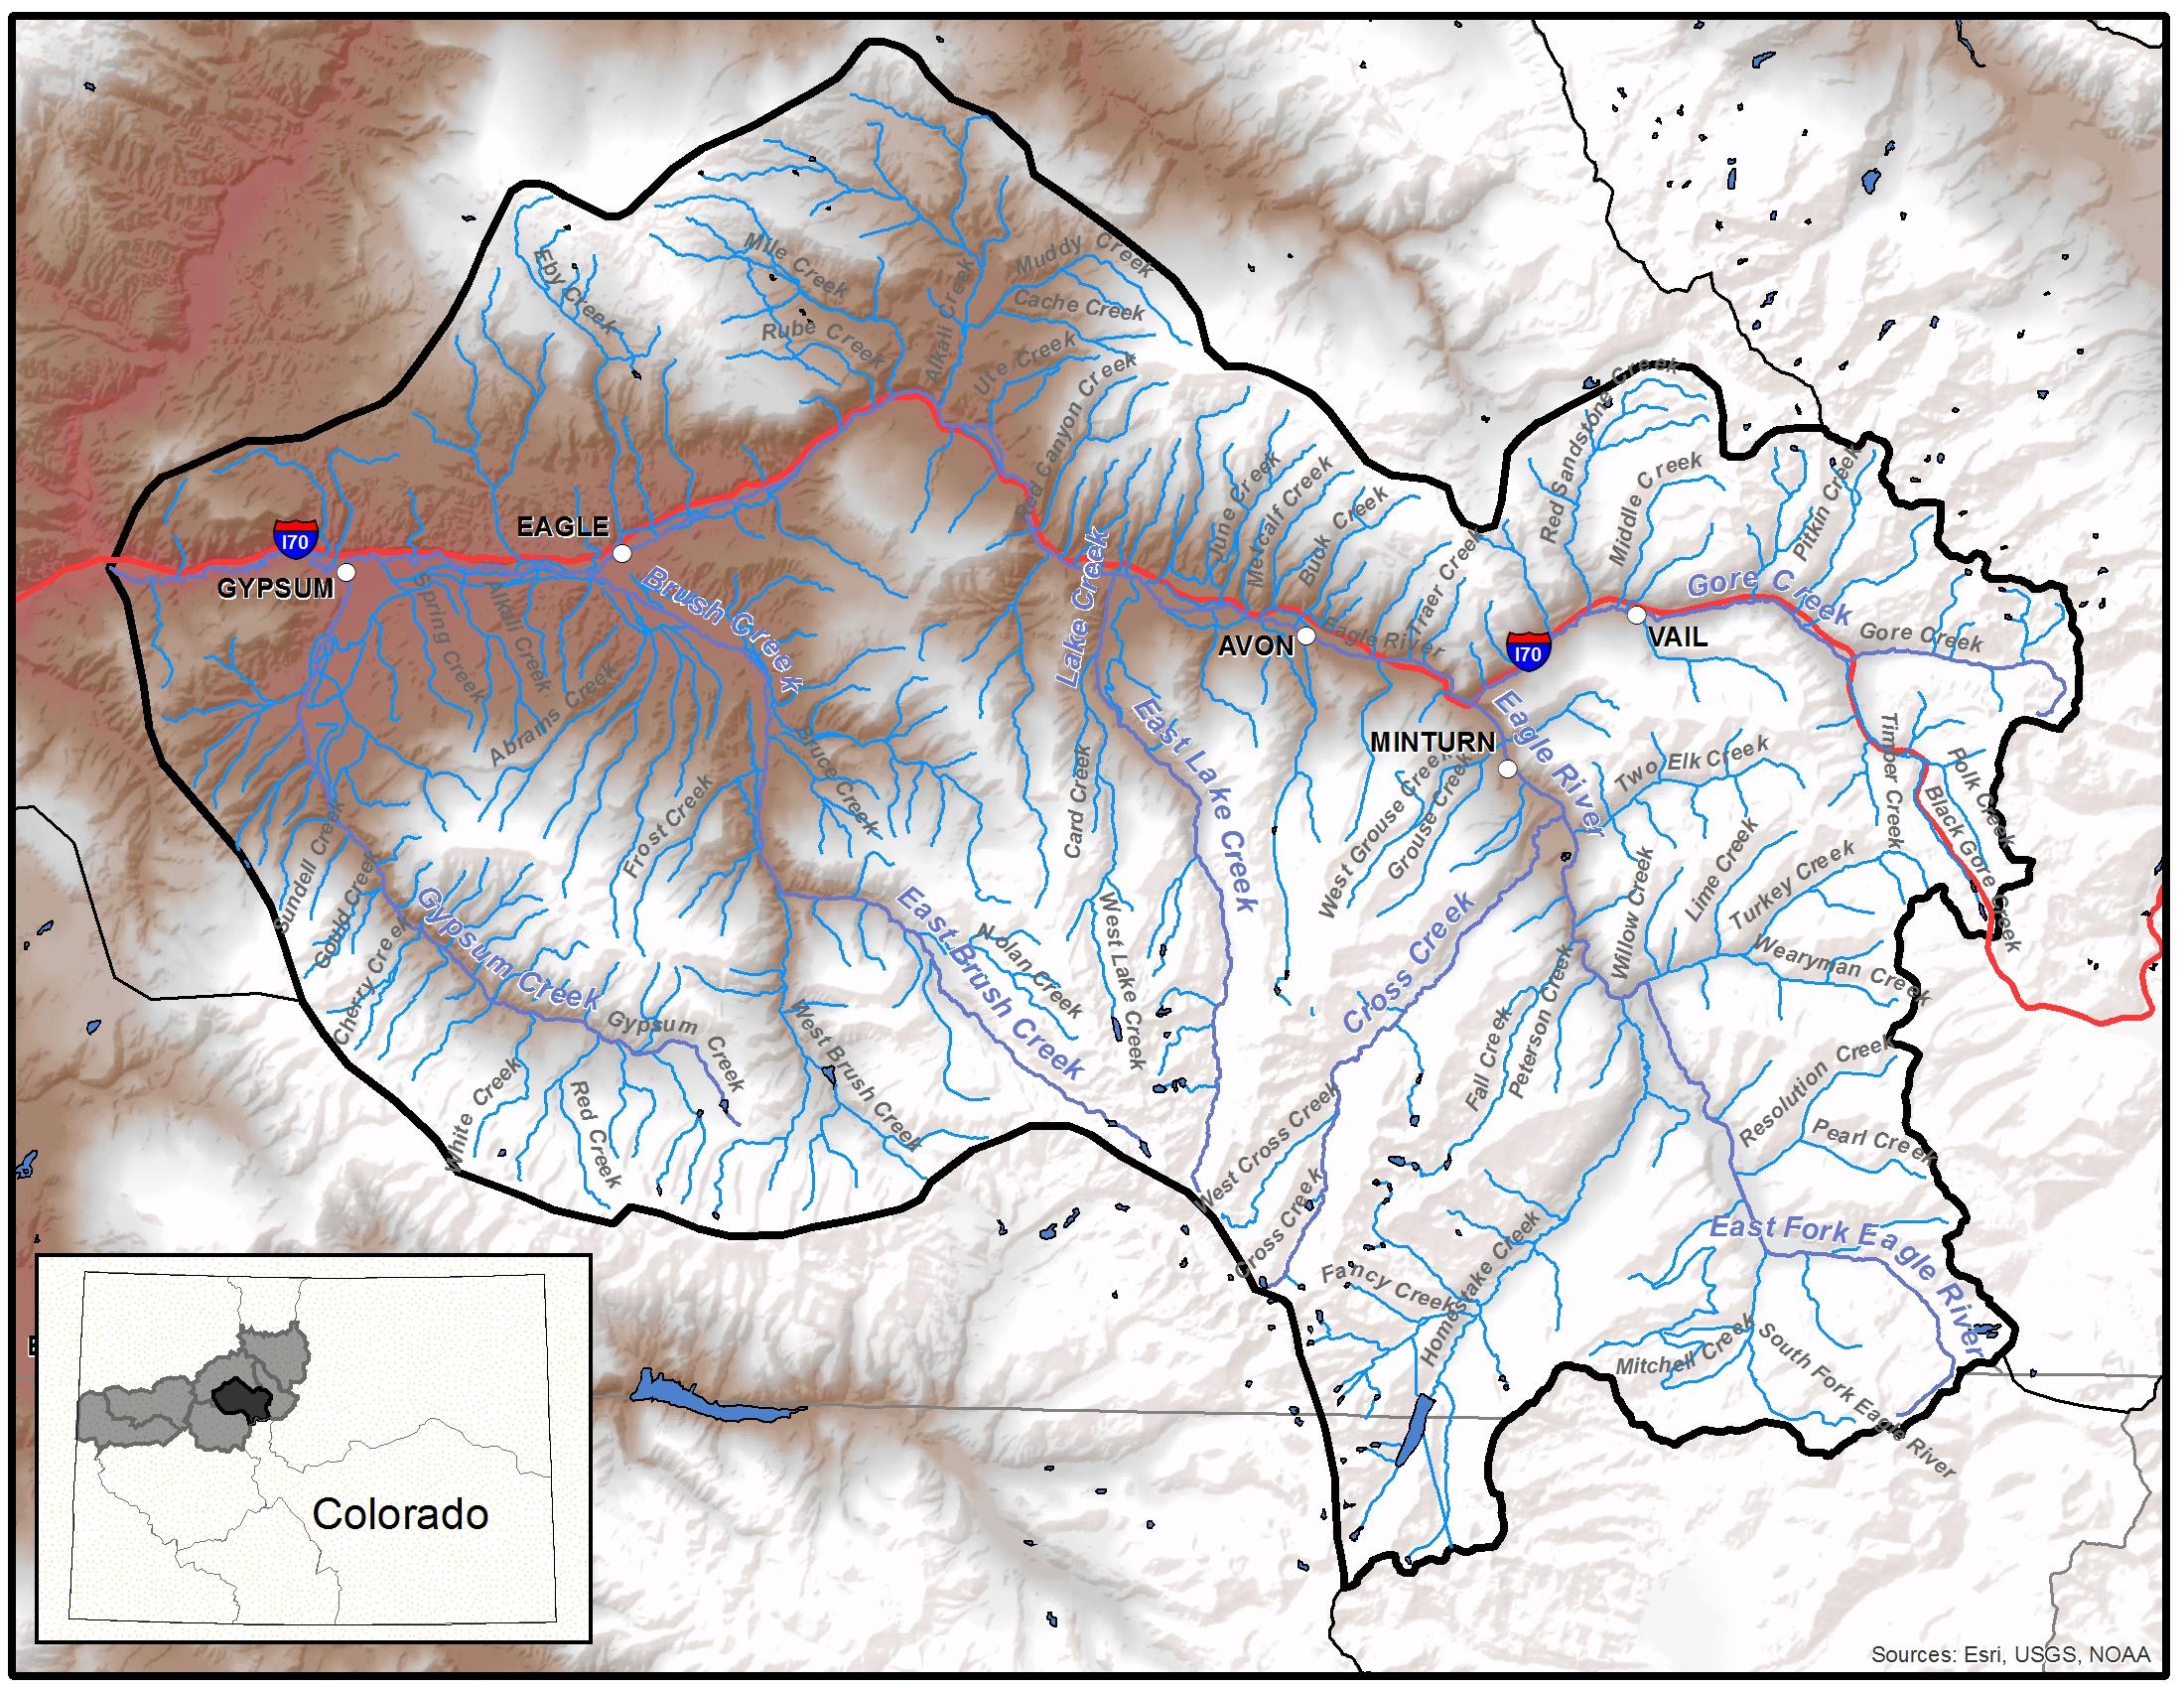 Eagle River Region